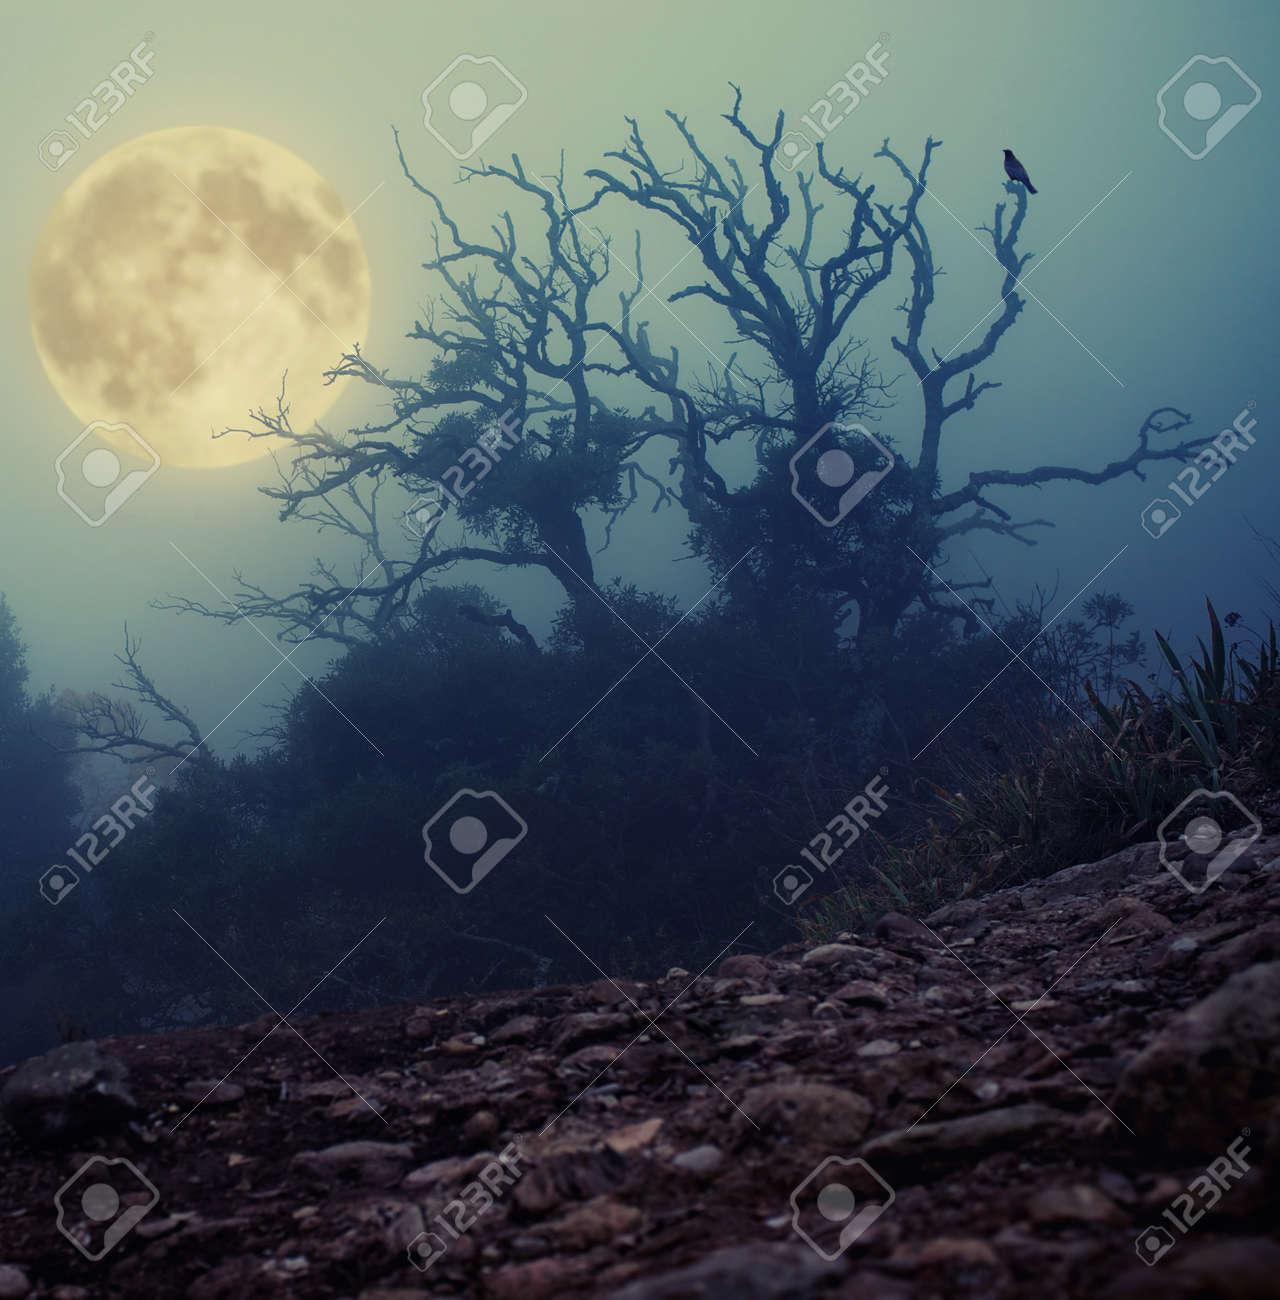 Old spooky tree Stock Photo - 11940386